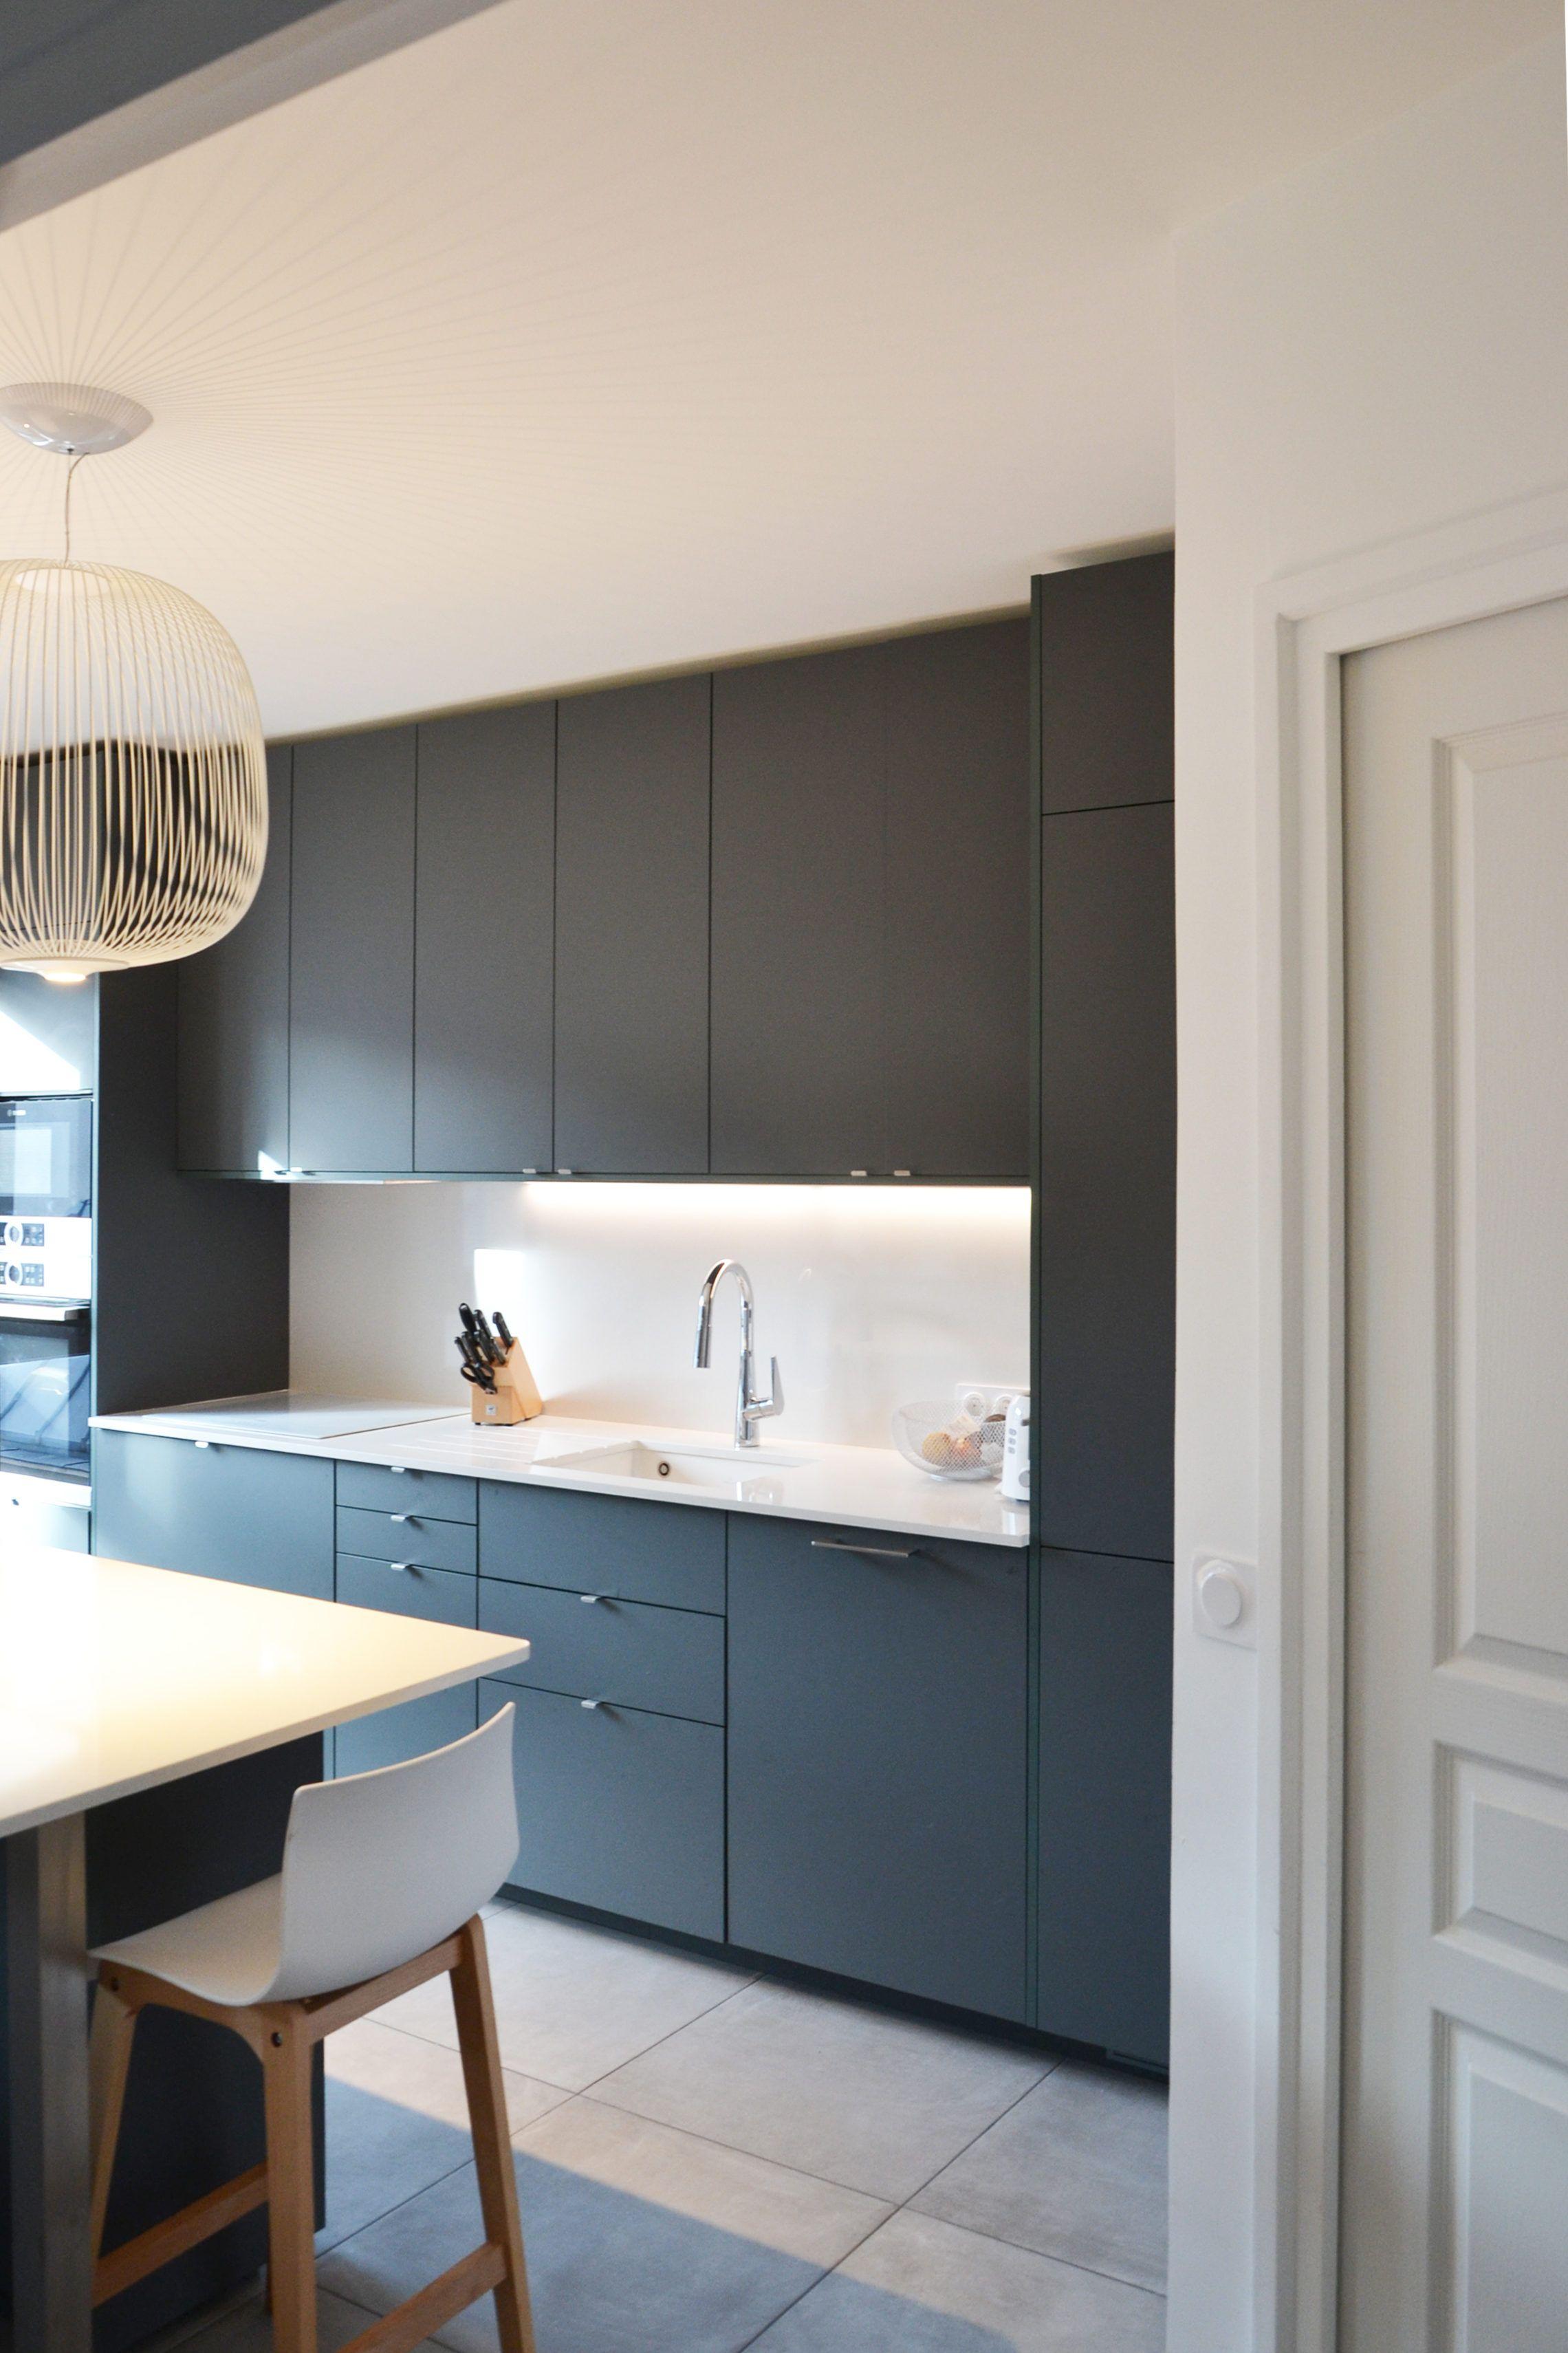 Ikea Metod With Voxtorp Doors Ikea Kitchen New Kitchen Cabinets Kitchen Design